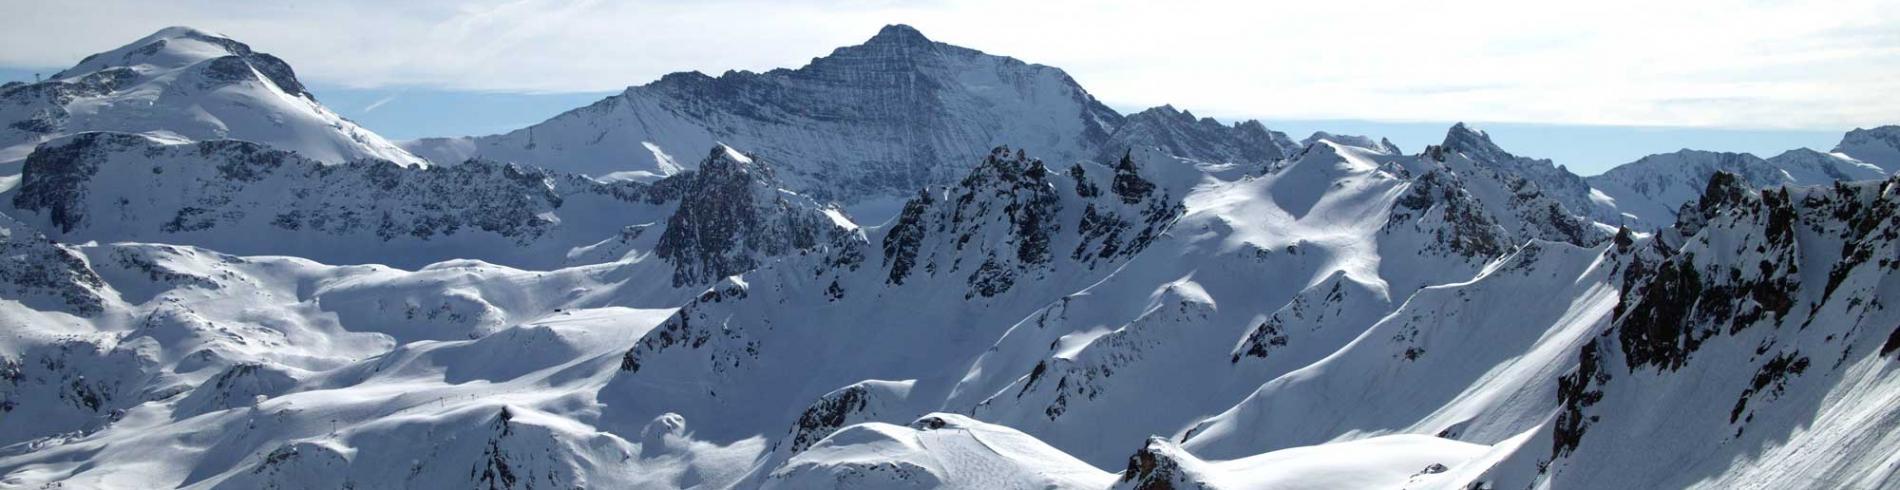 panorama of the mountains near Tignes